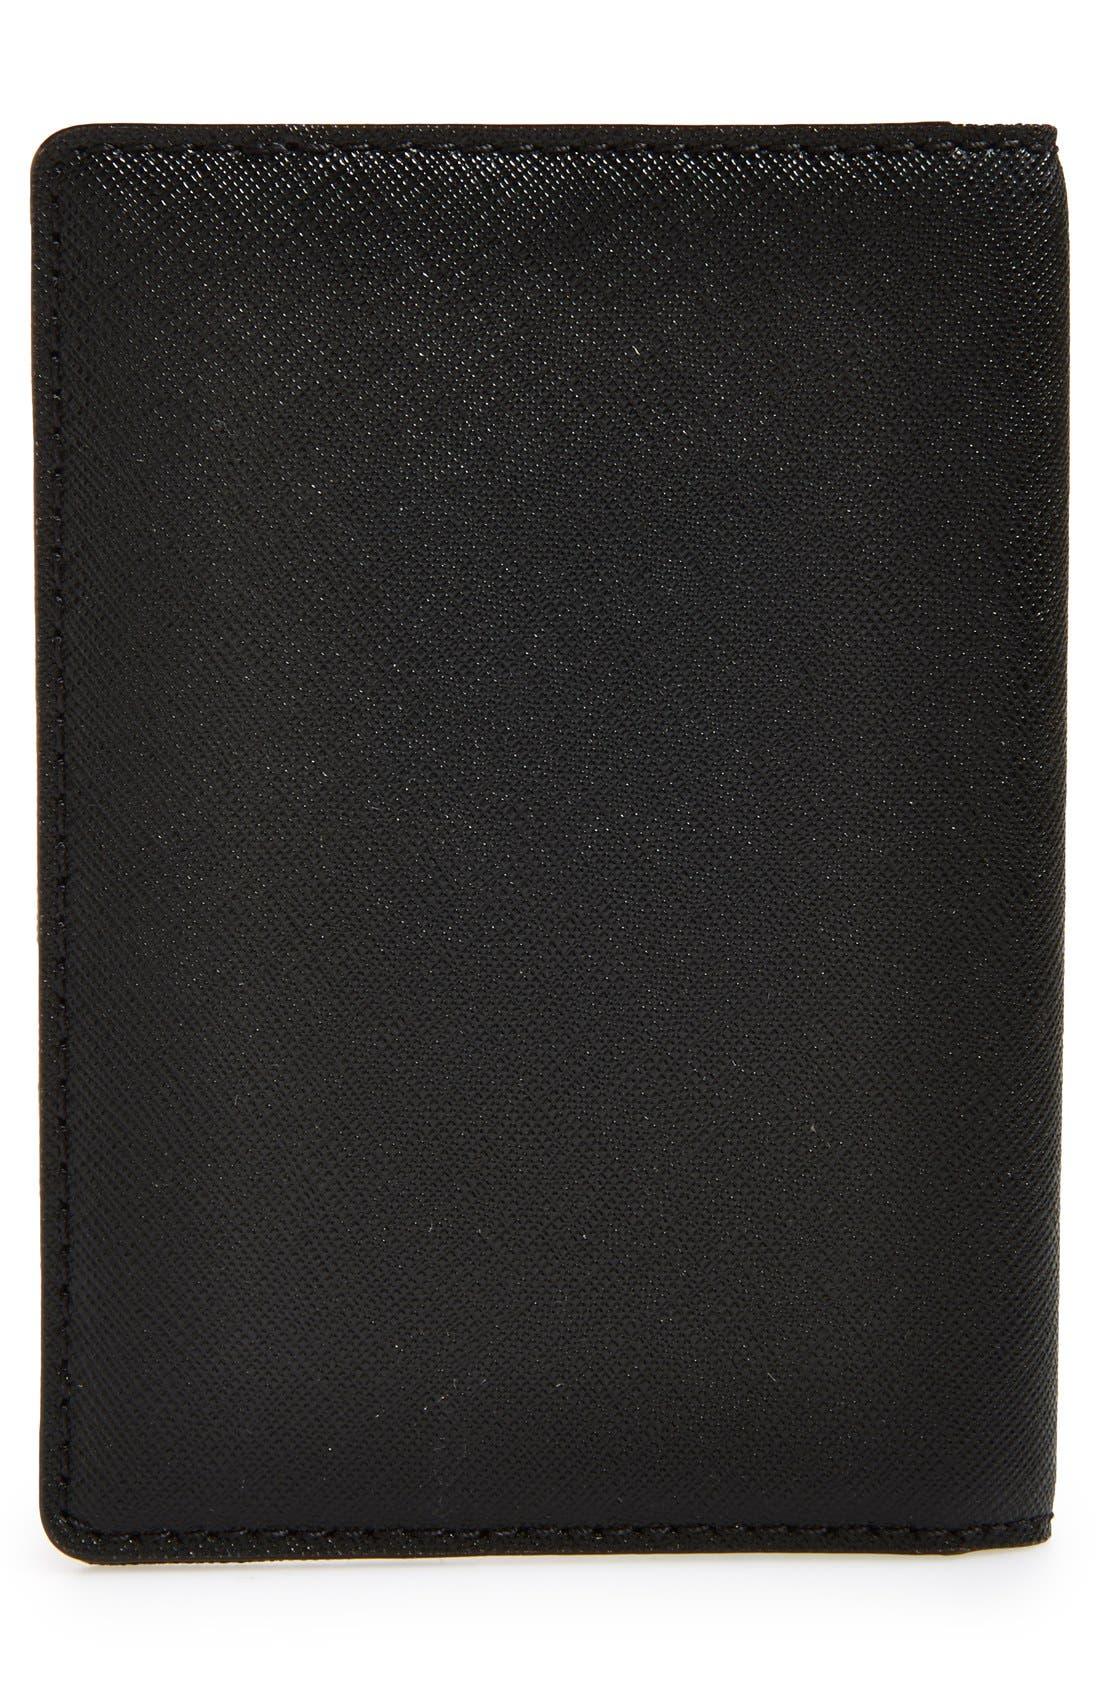 KATE SPADE NEW YORK,                             'cedar street' leather passport holder,                             Alternate thumbnail 2, color,                             001